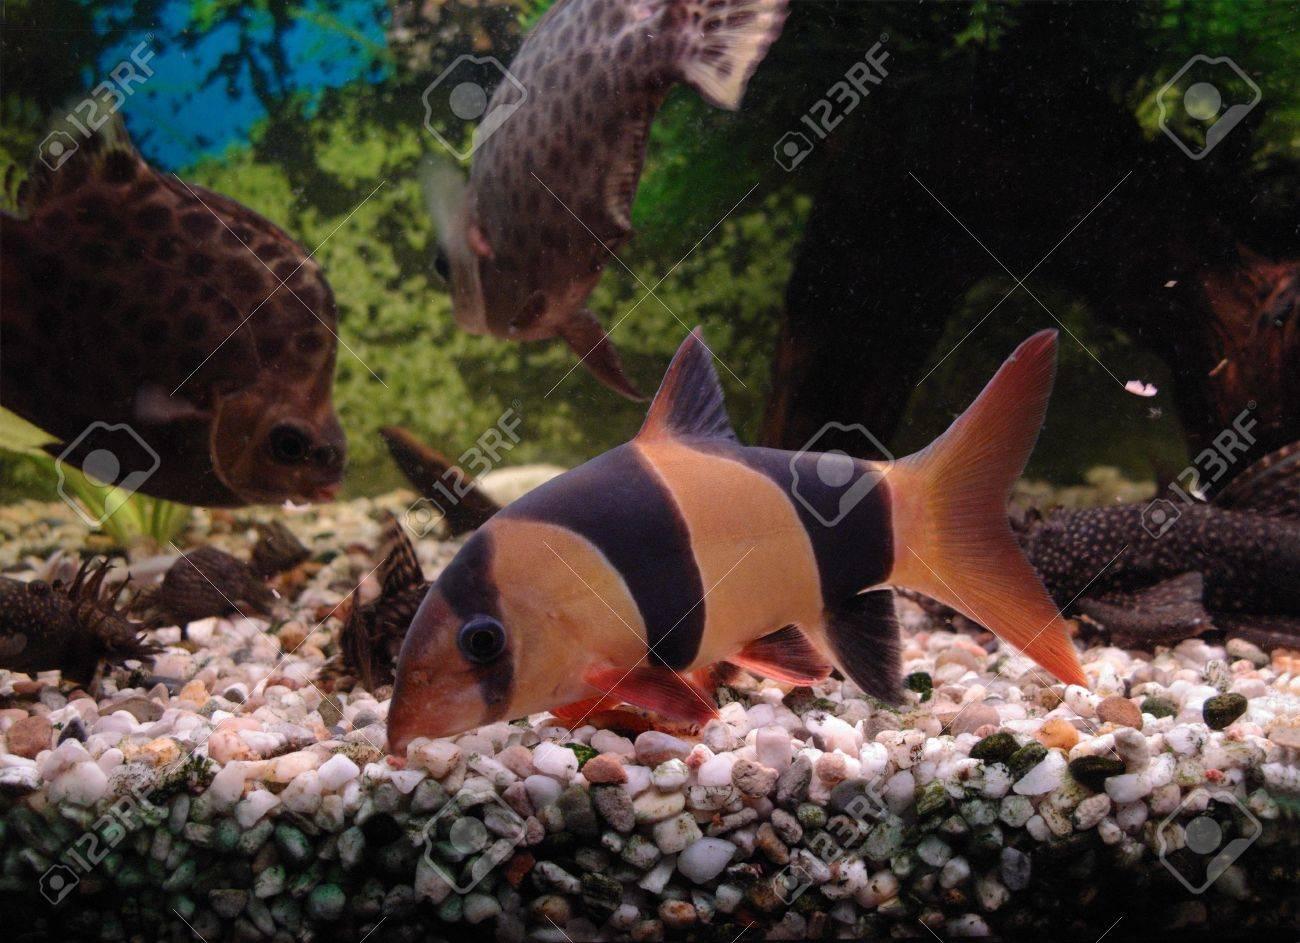 Botia clown (Botia macracantha) looking for food in aquarium Stock Photo - 6473107